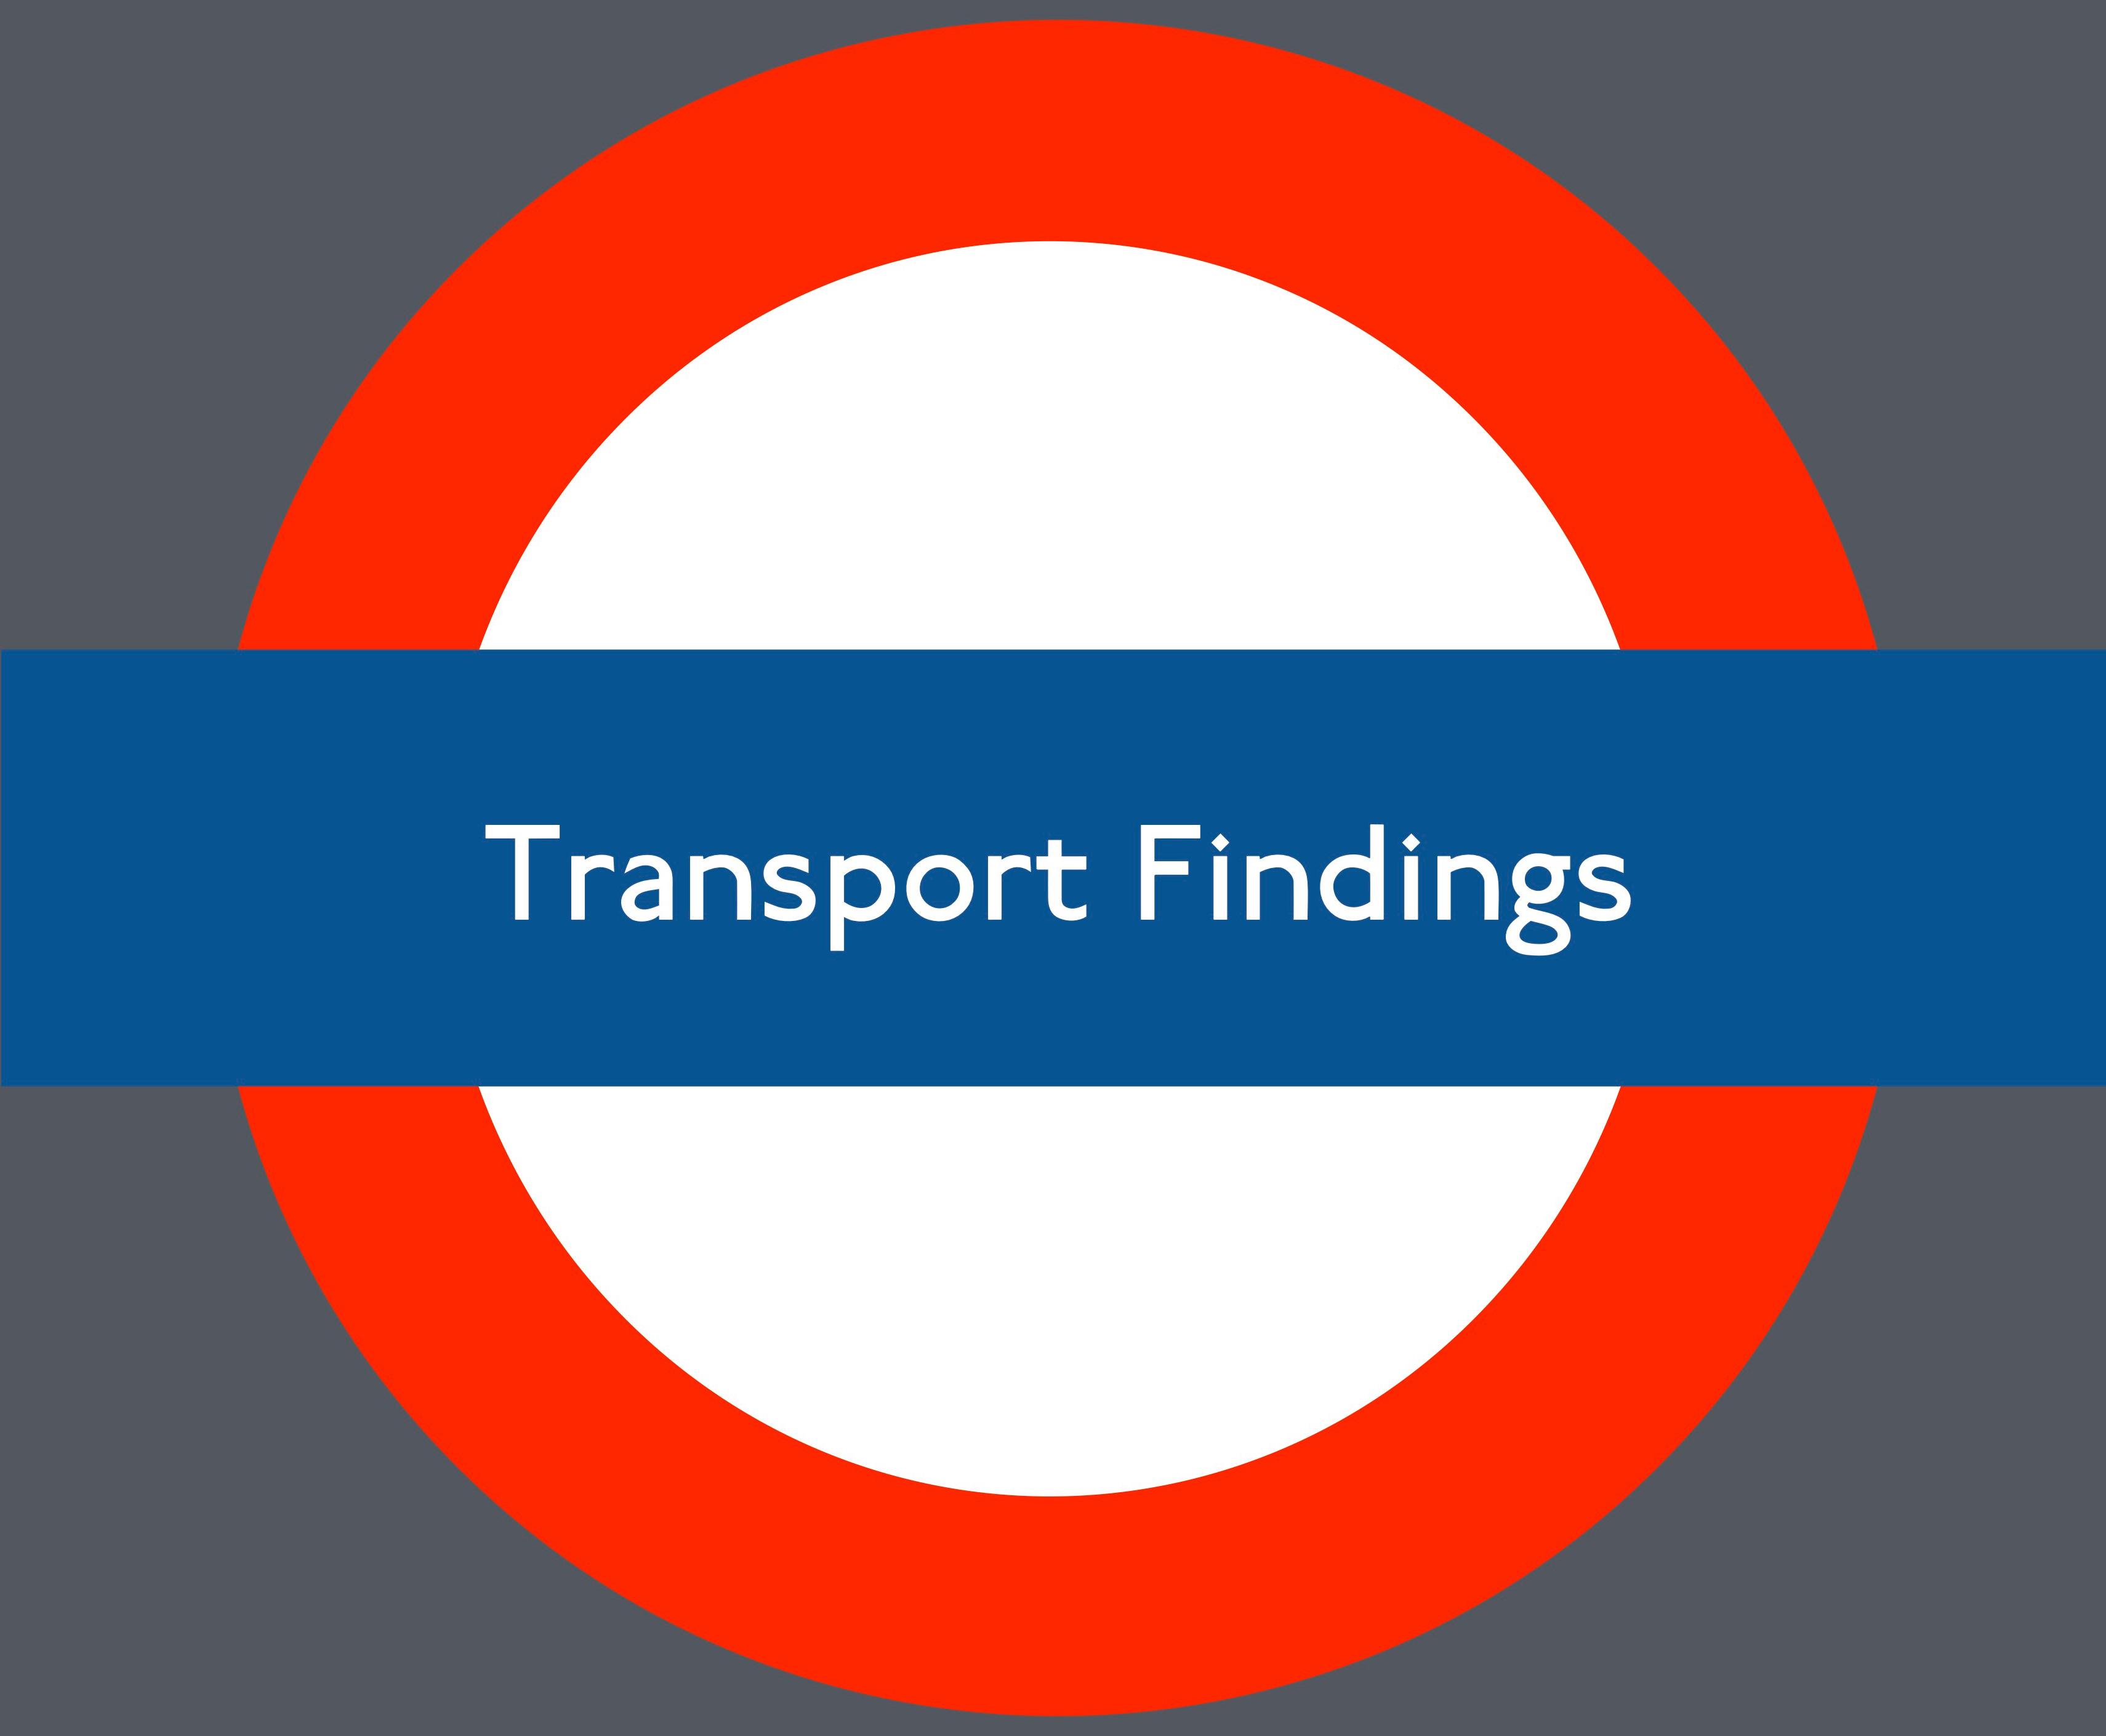 Transport Findings